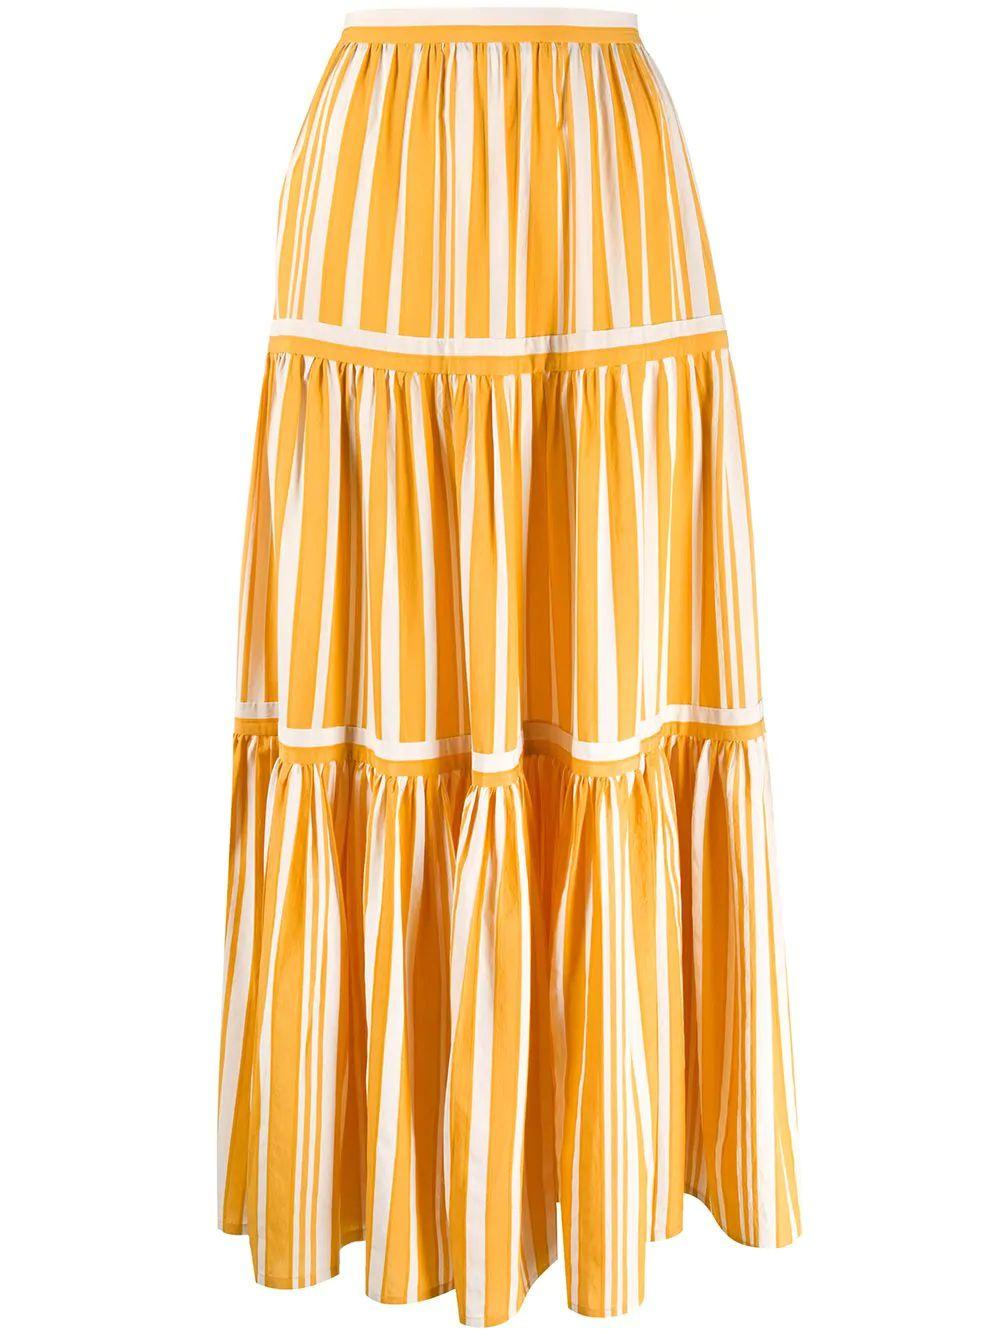 Parasol Striped Skirt Item # SP02